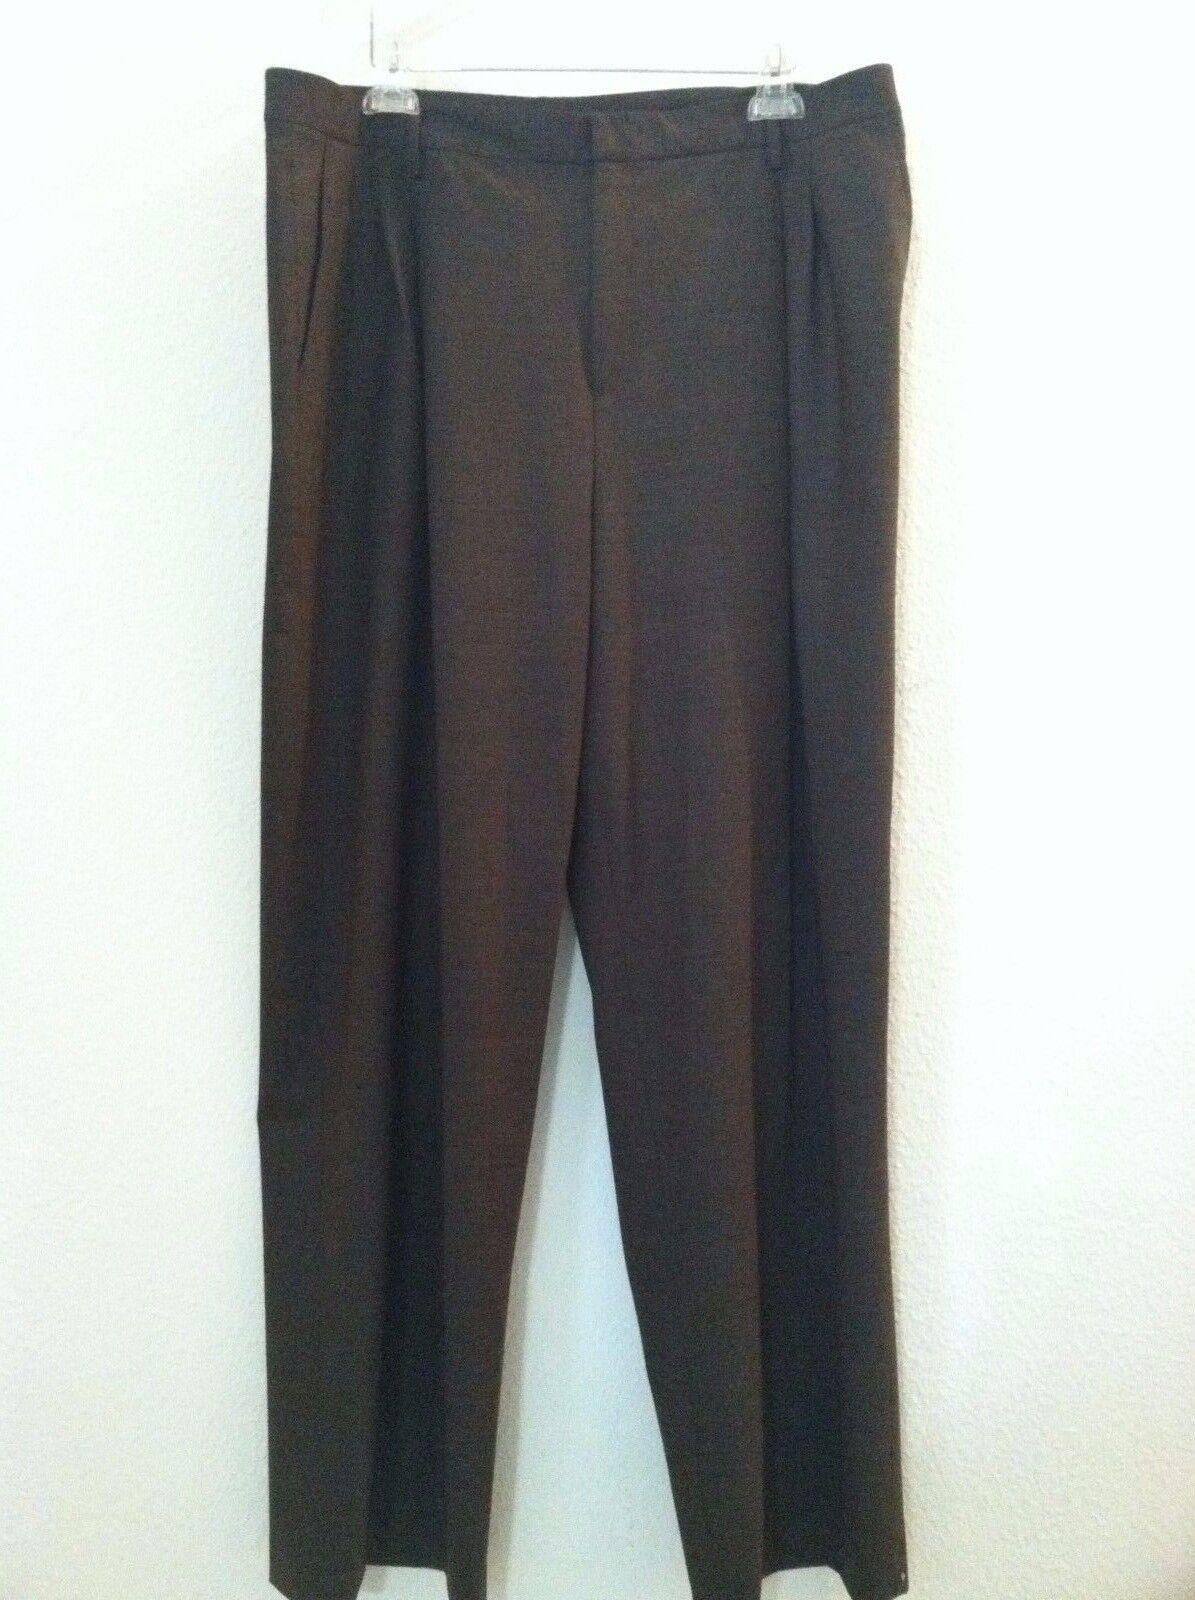 New Linda Allard Ellen Tracy 18 pant brown dress career work sz  245